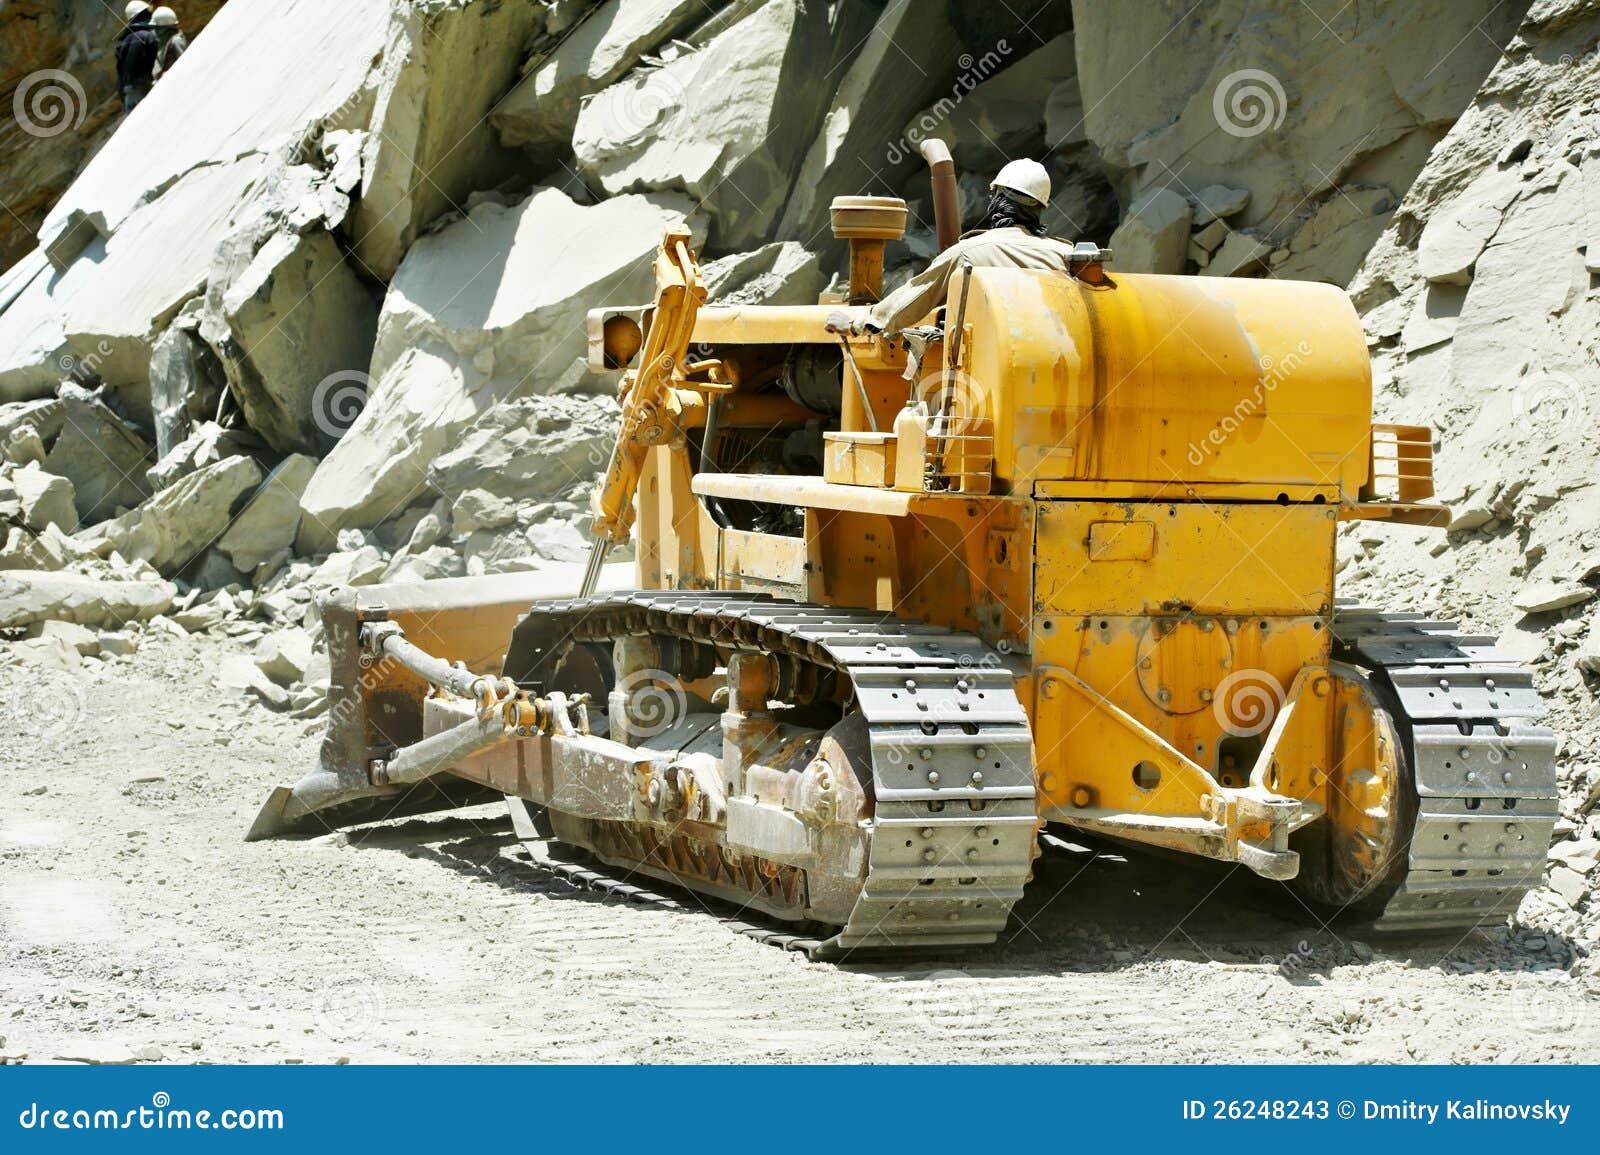 Track Type Loader Bulldozer Excavator At Road Work Stock